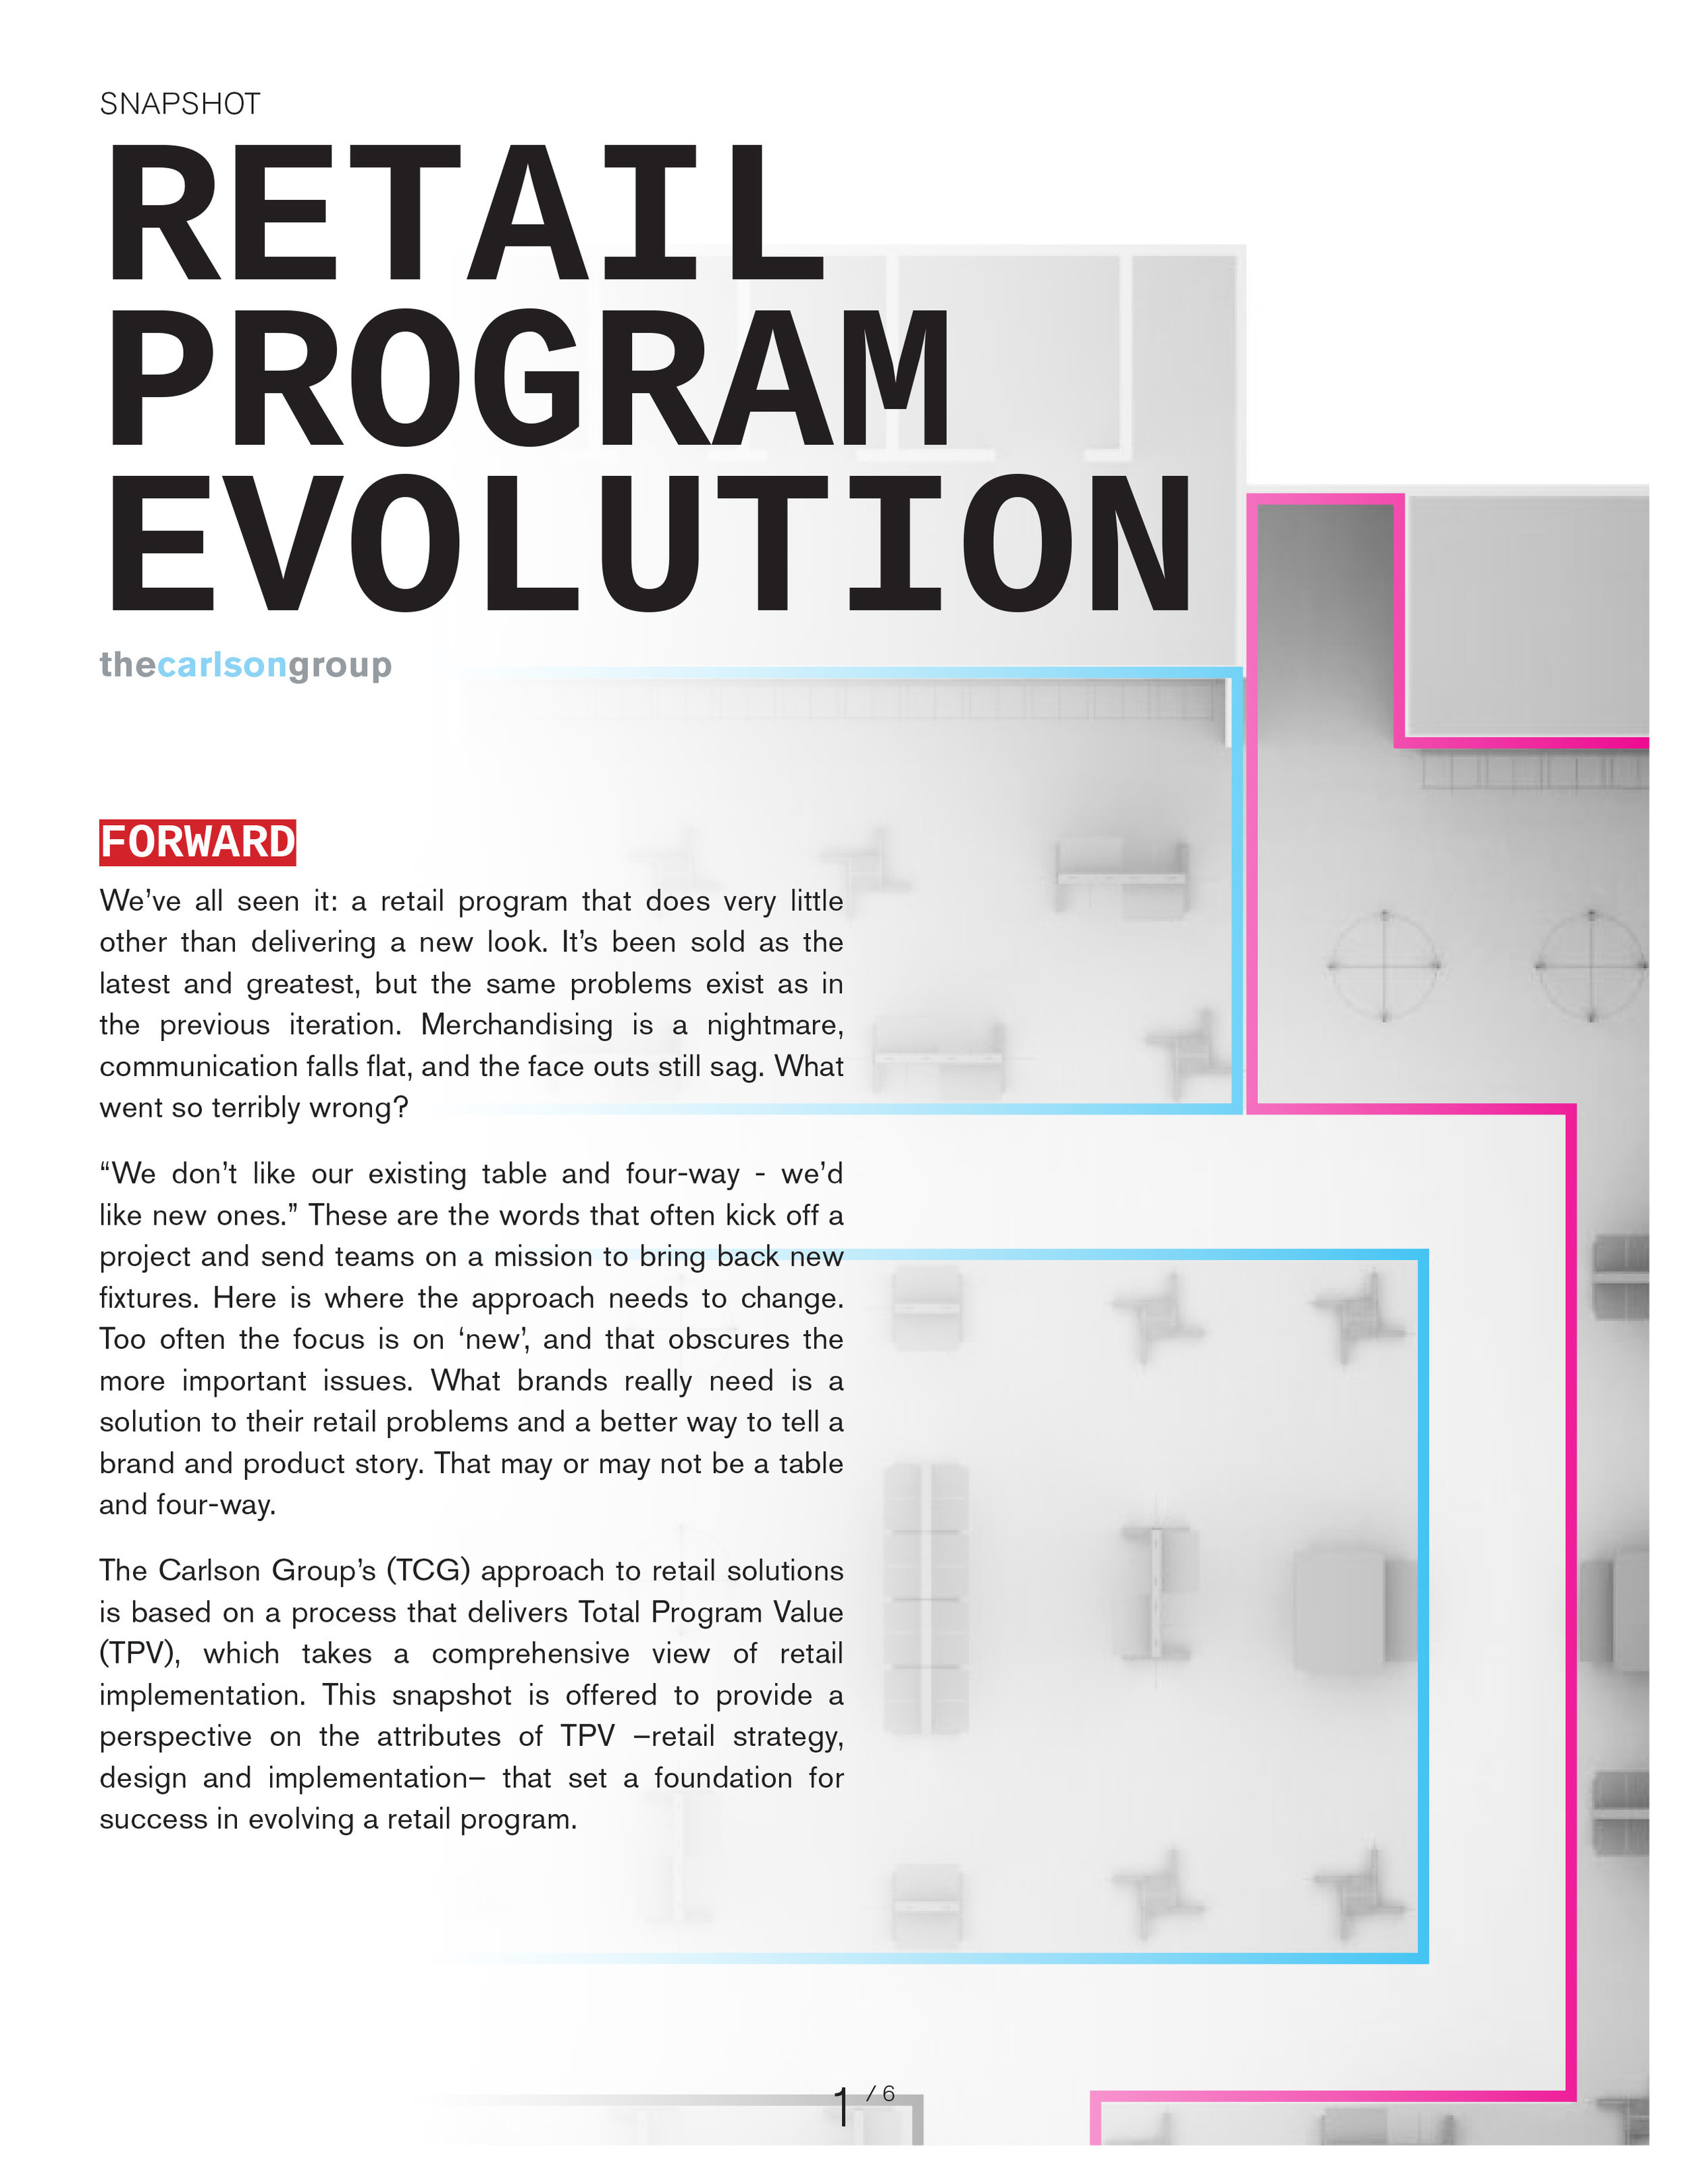 RETAIL PROGRAM EVOLUTION